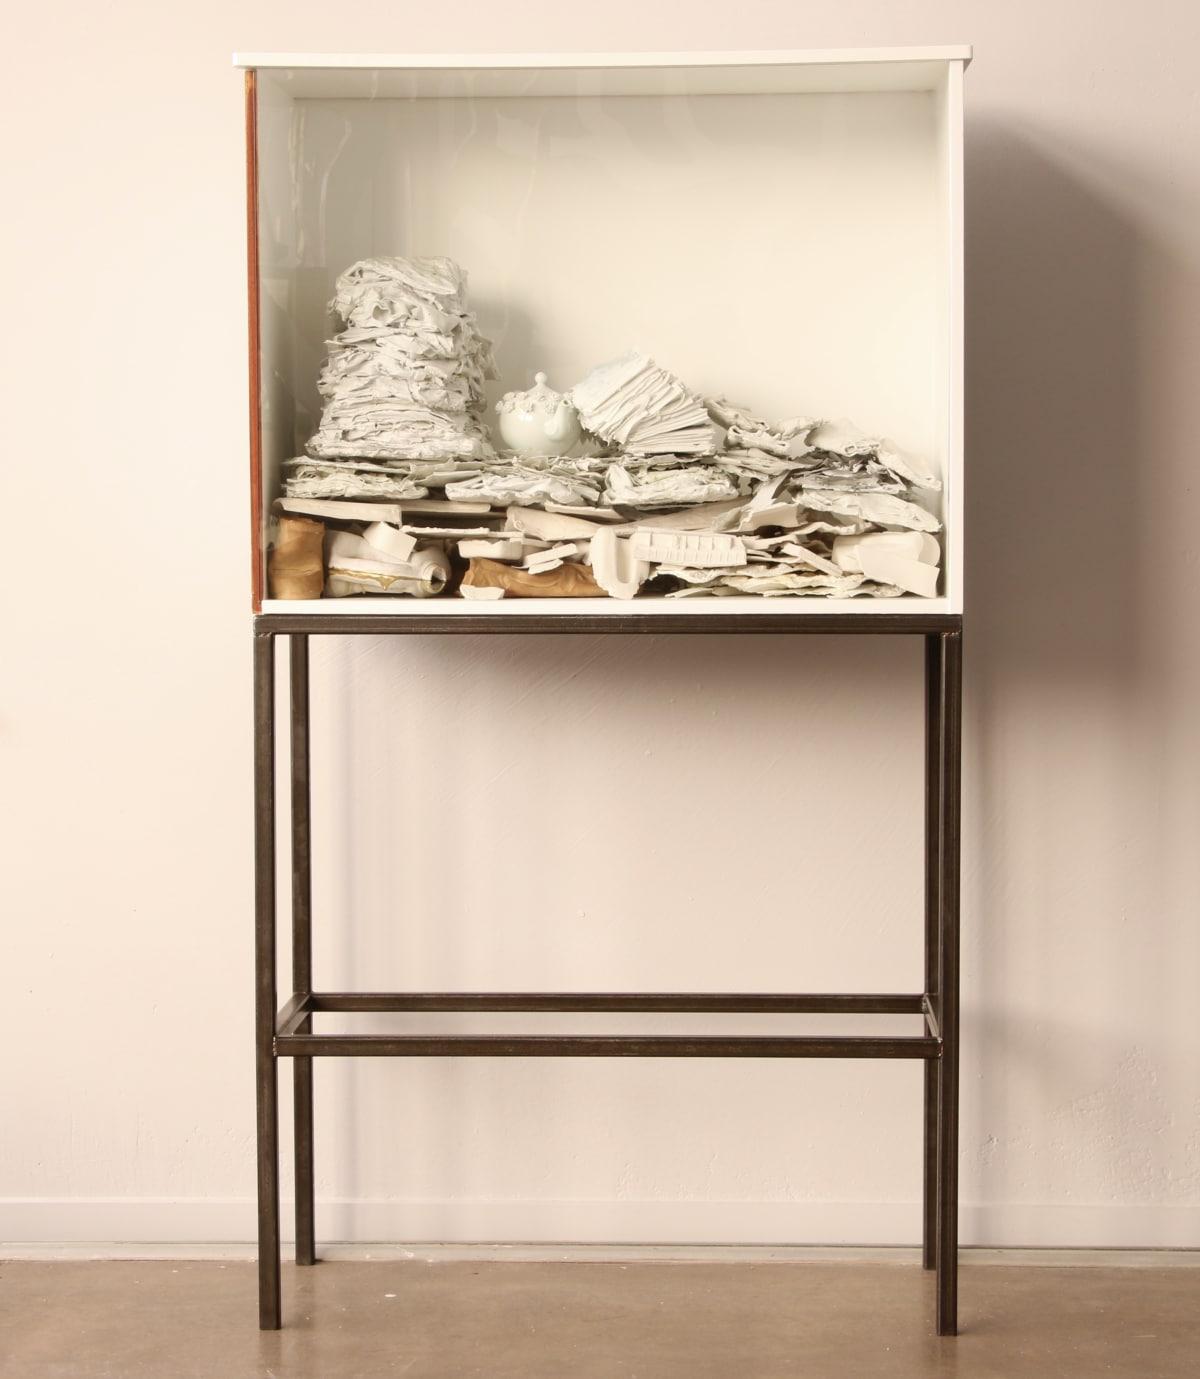 Marita Hewitt Untitled (A Strata of Trying) Mixed media 62.6 x 35 x 15.4 in 159 x 89 x 39 cm